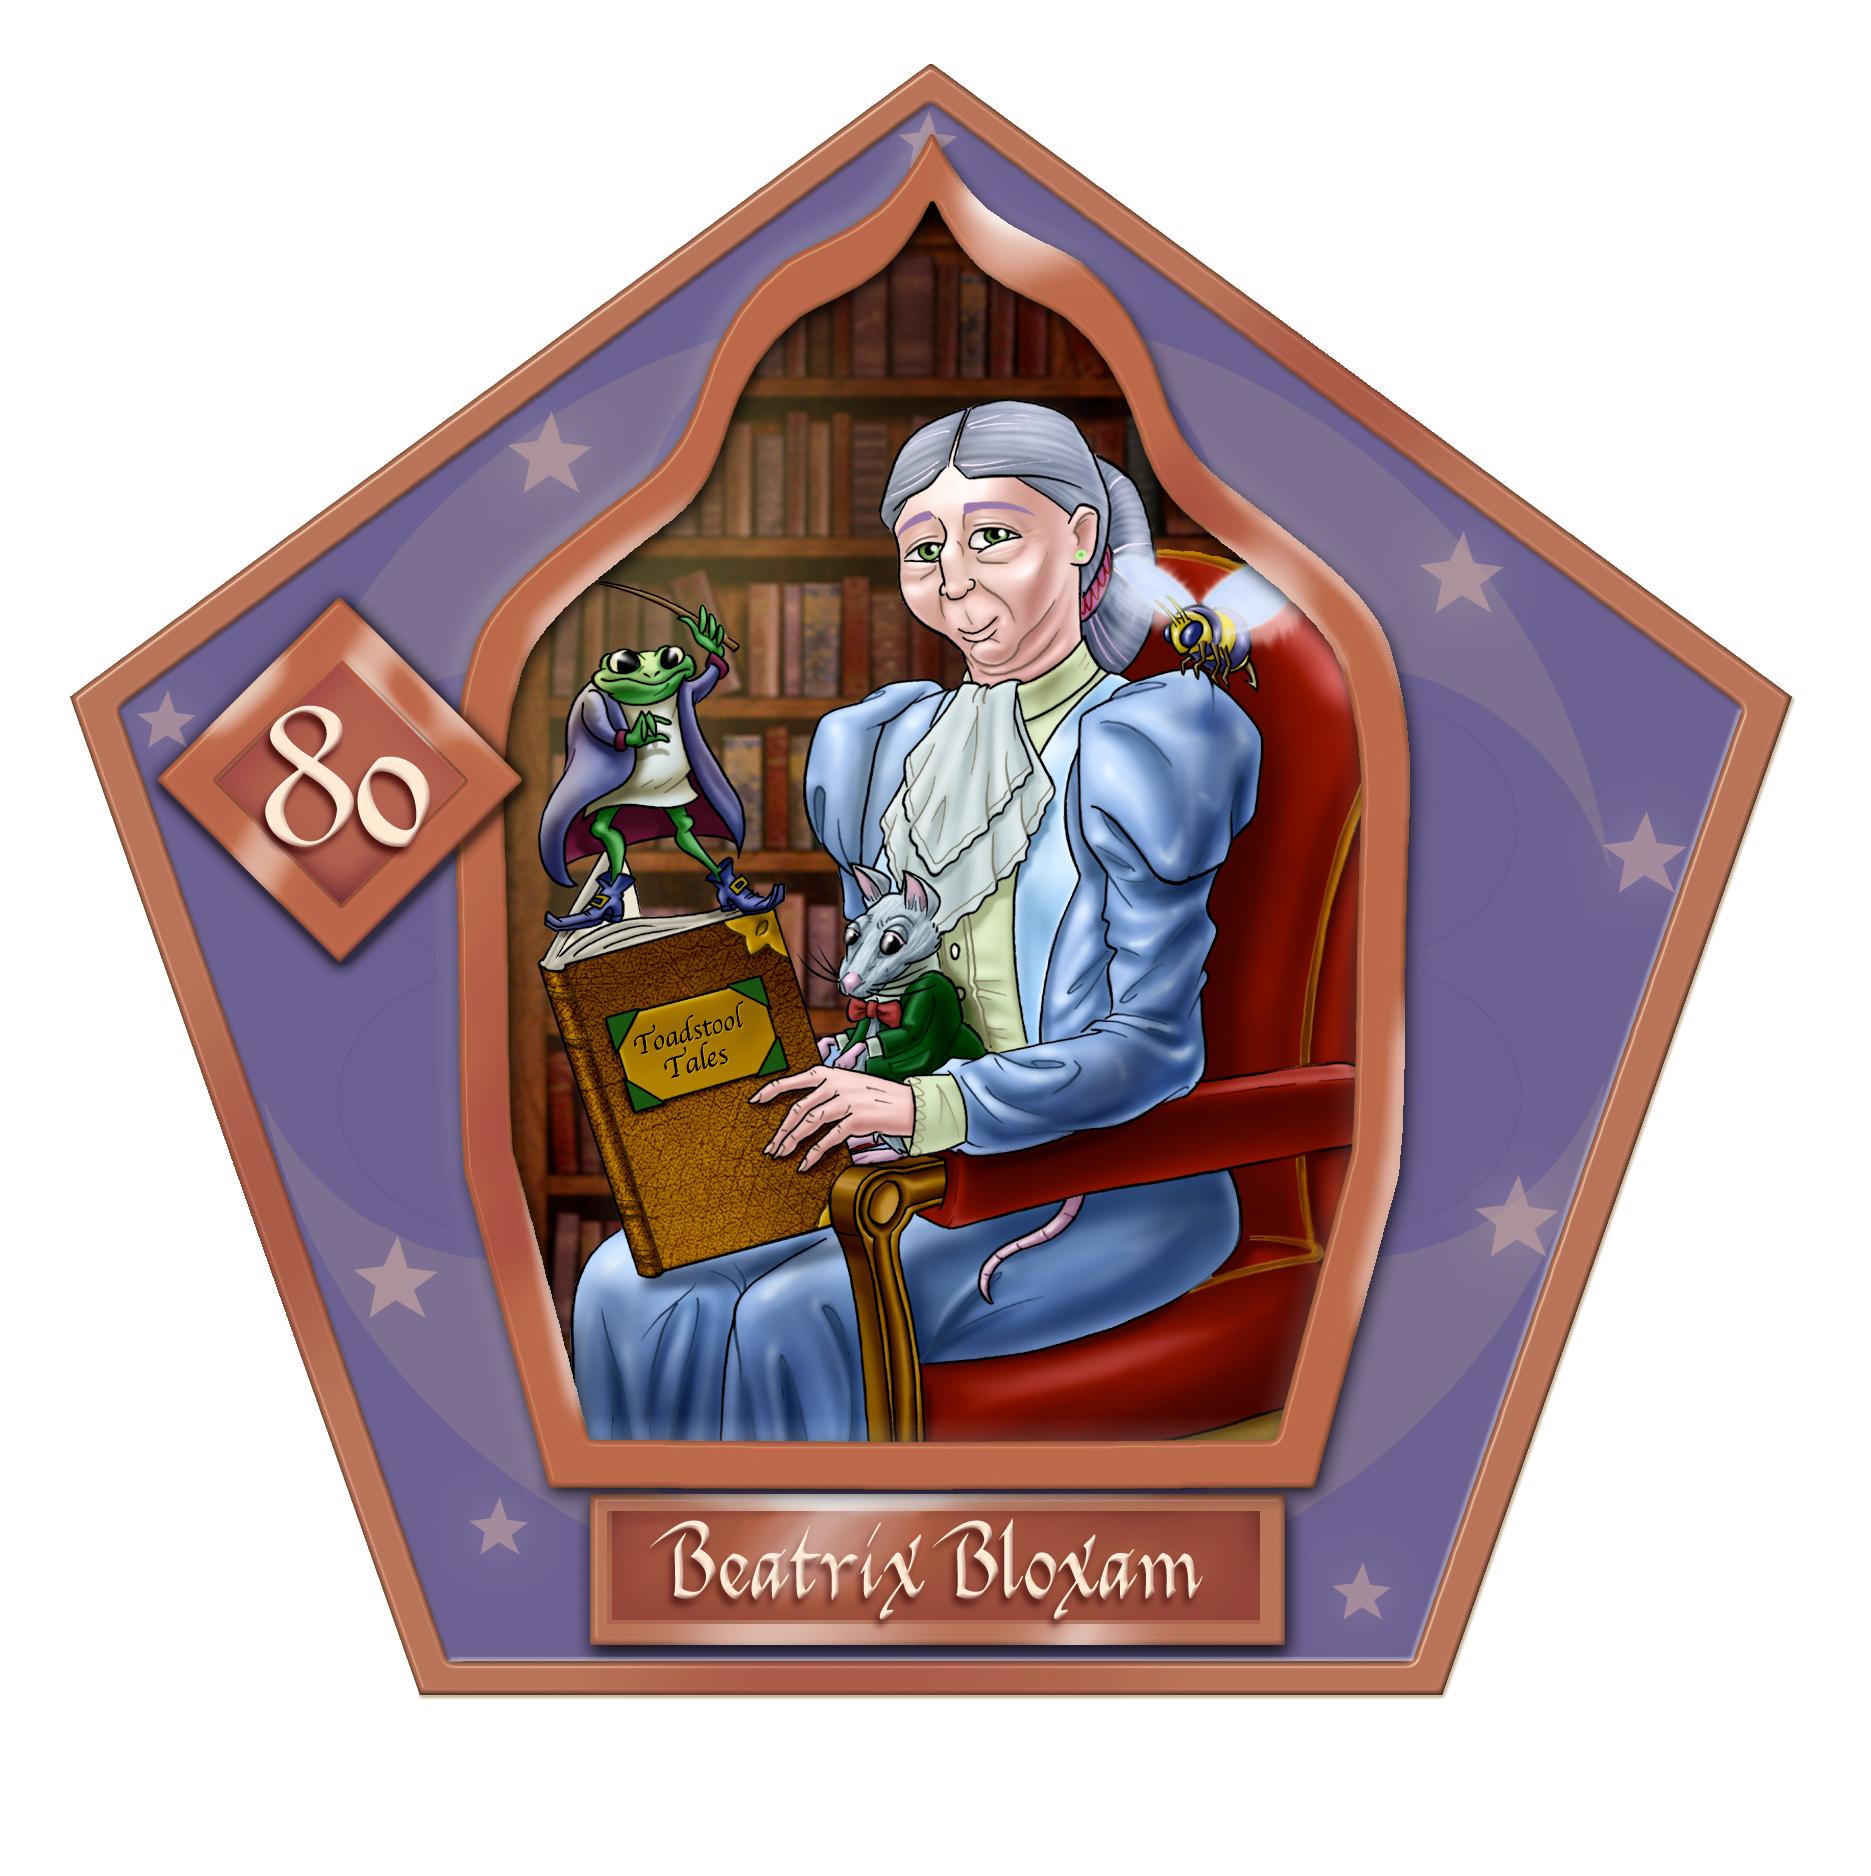 File:Beatrix Bloxam-80-chocFrogCard.png